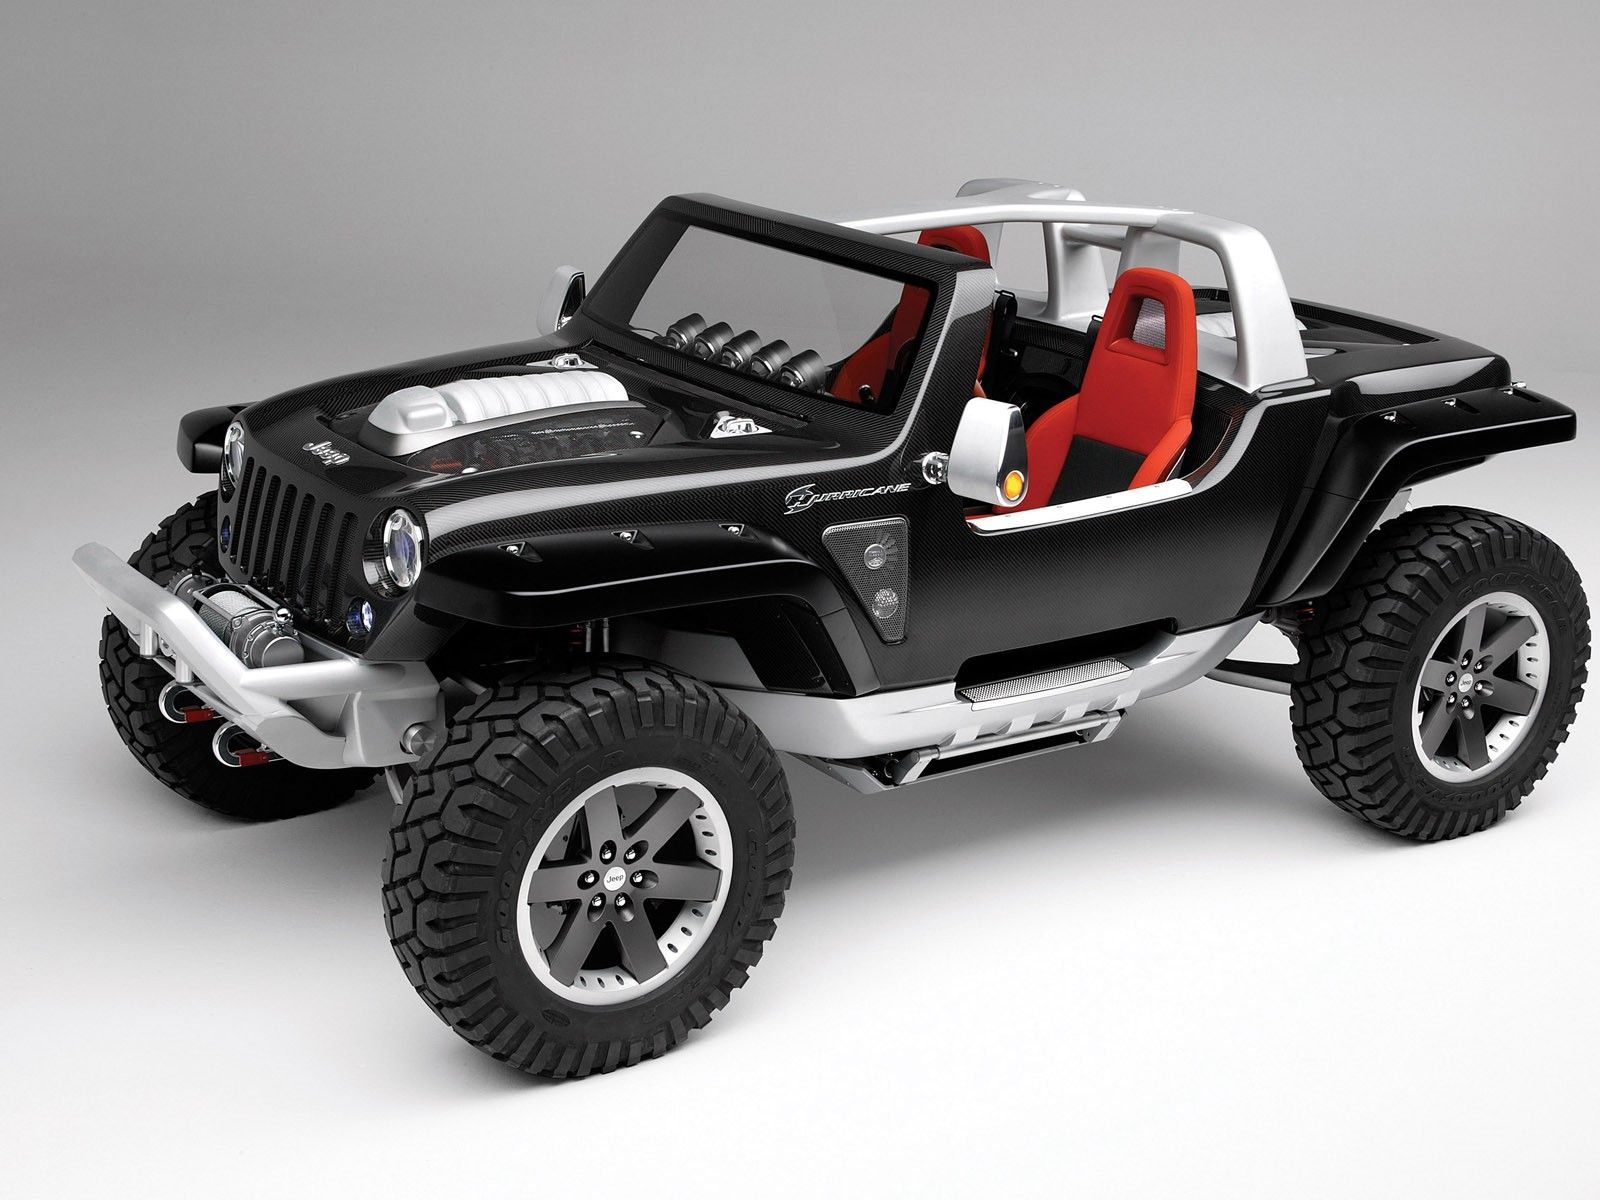 Jeep Hurricane Concept Jpg 1600 1200 Jeep Concept Jeep Cars Jeep